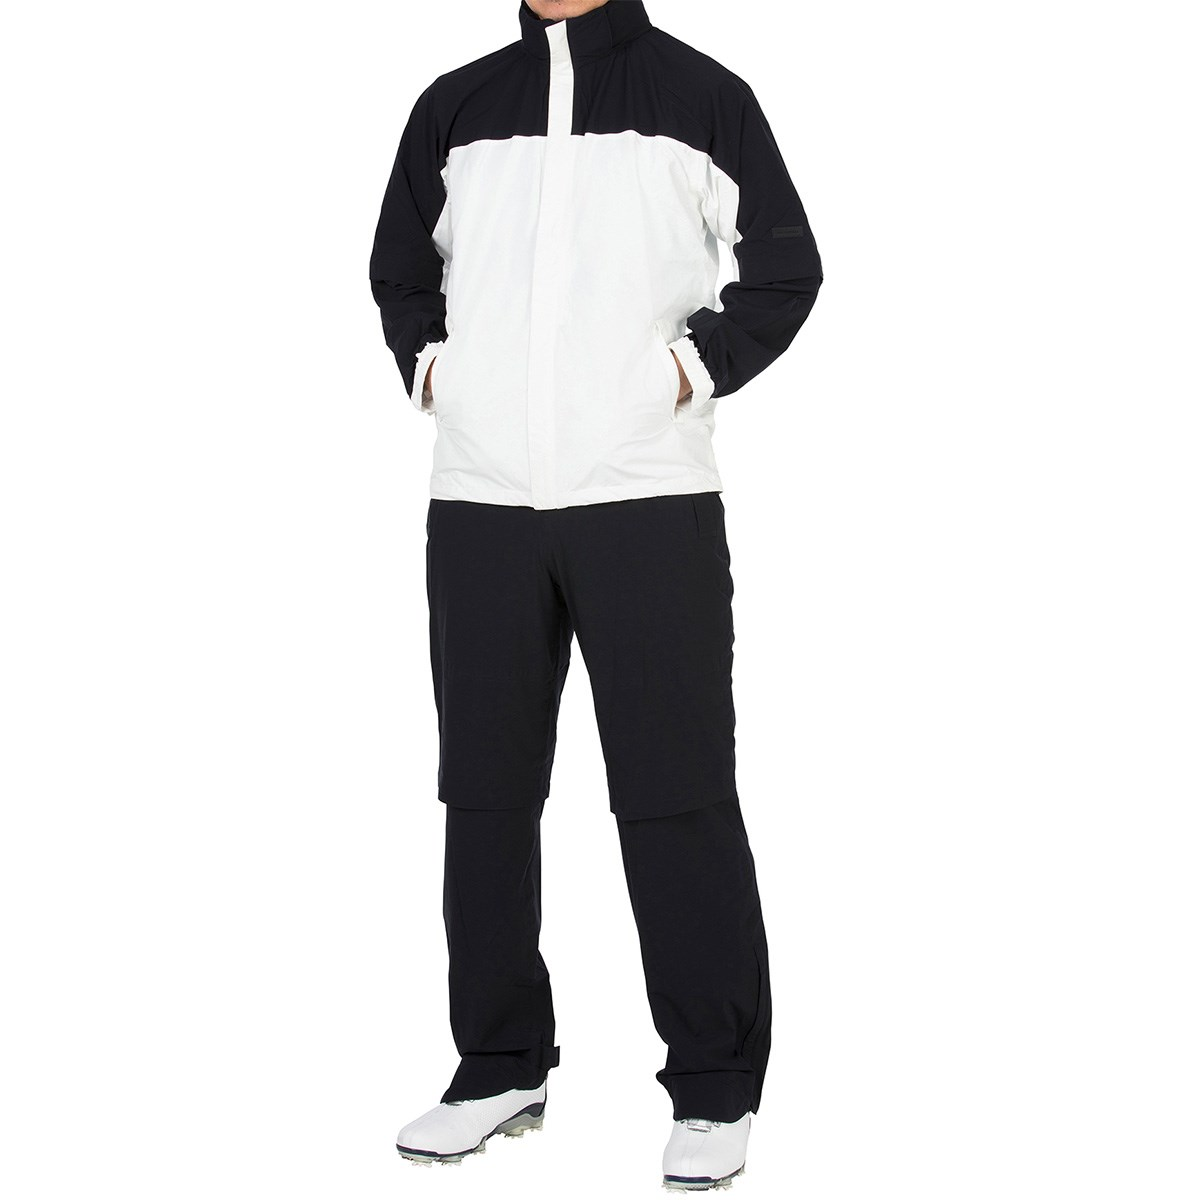 GDO オリジナル GDO ORIGINAL ストレッチ レインスーツ L ブラック/ホワイト/ブラック